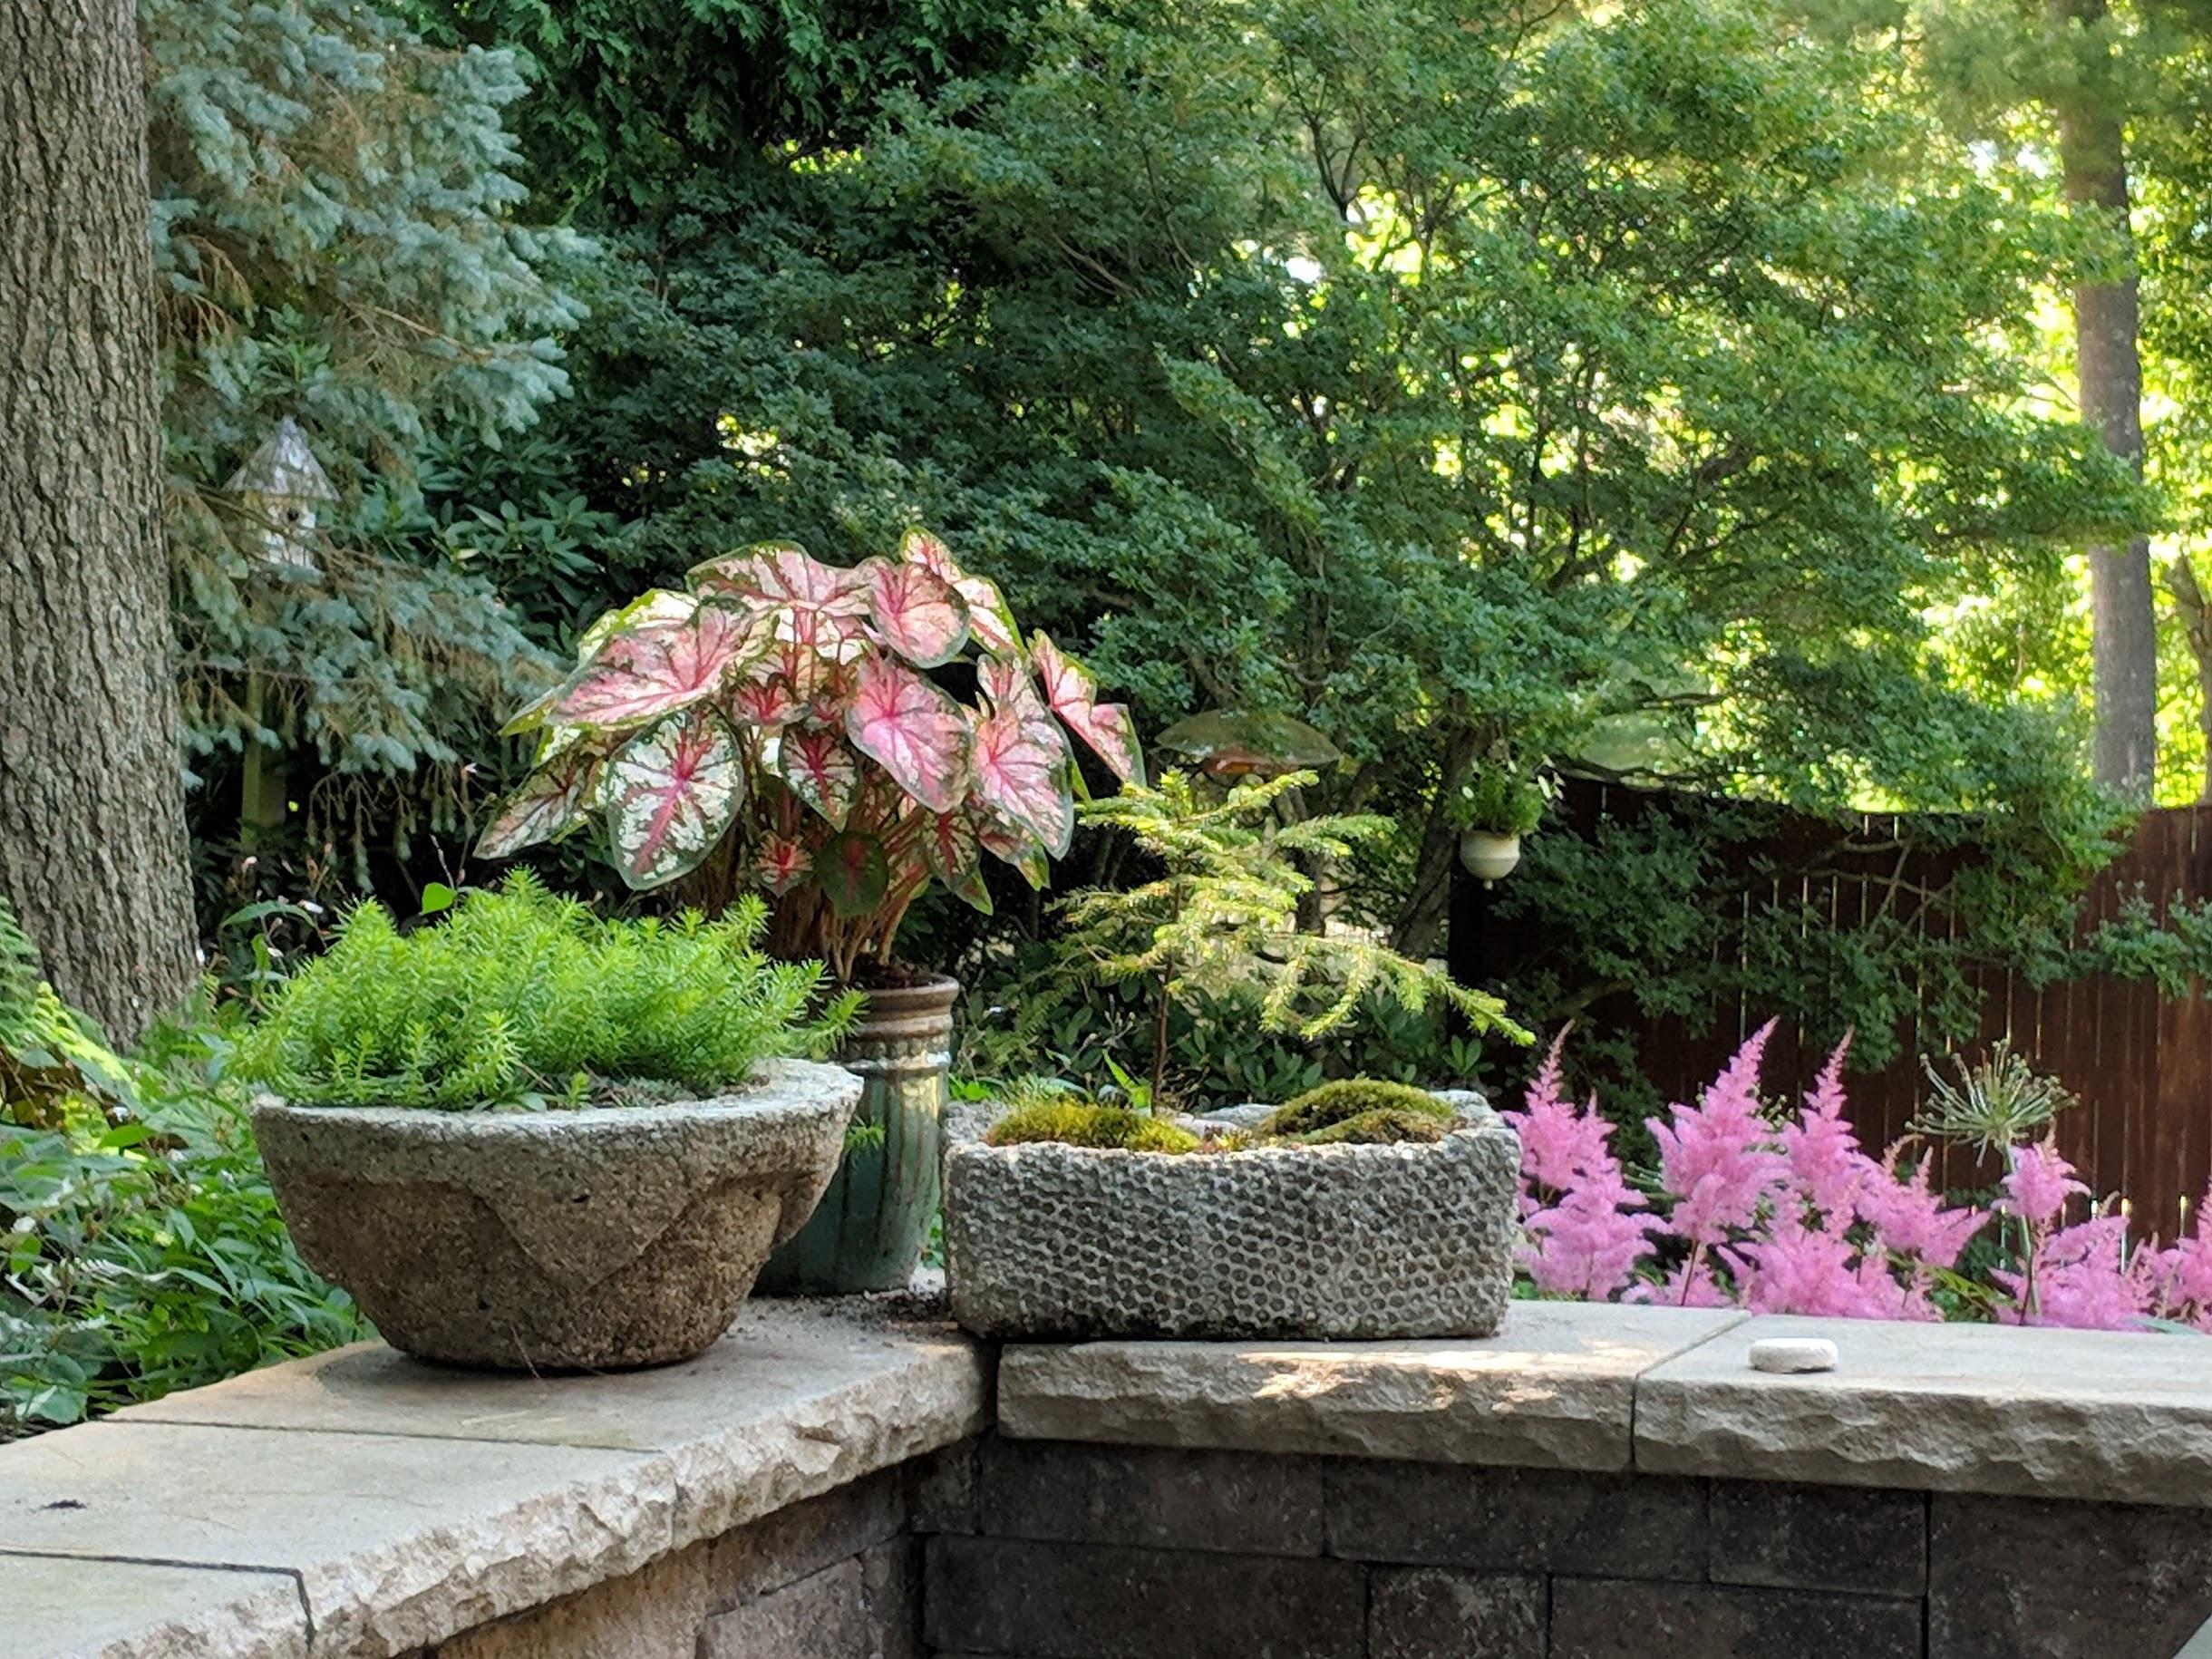 2018-07-04-patio-pots-caladium-sedum-hypertufa.jpg